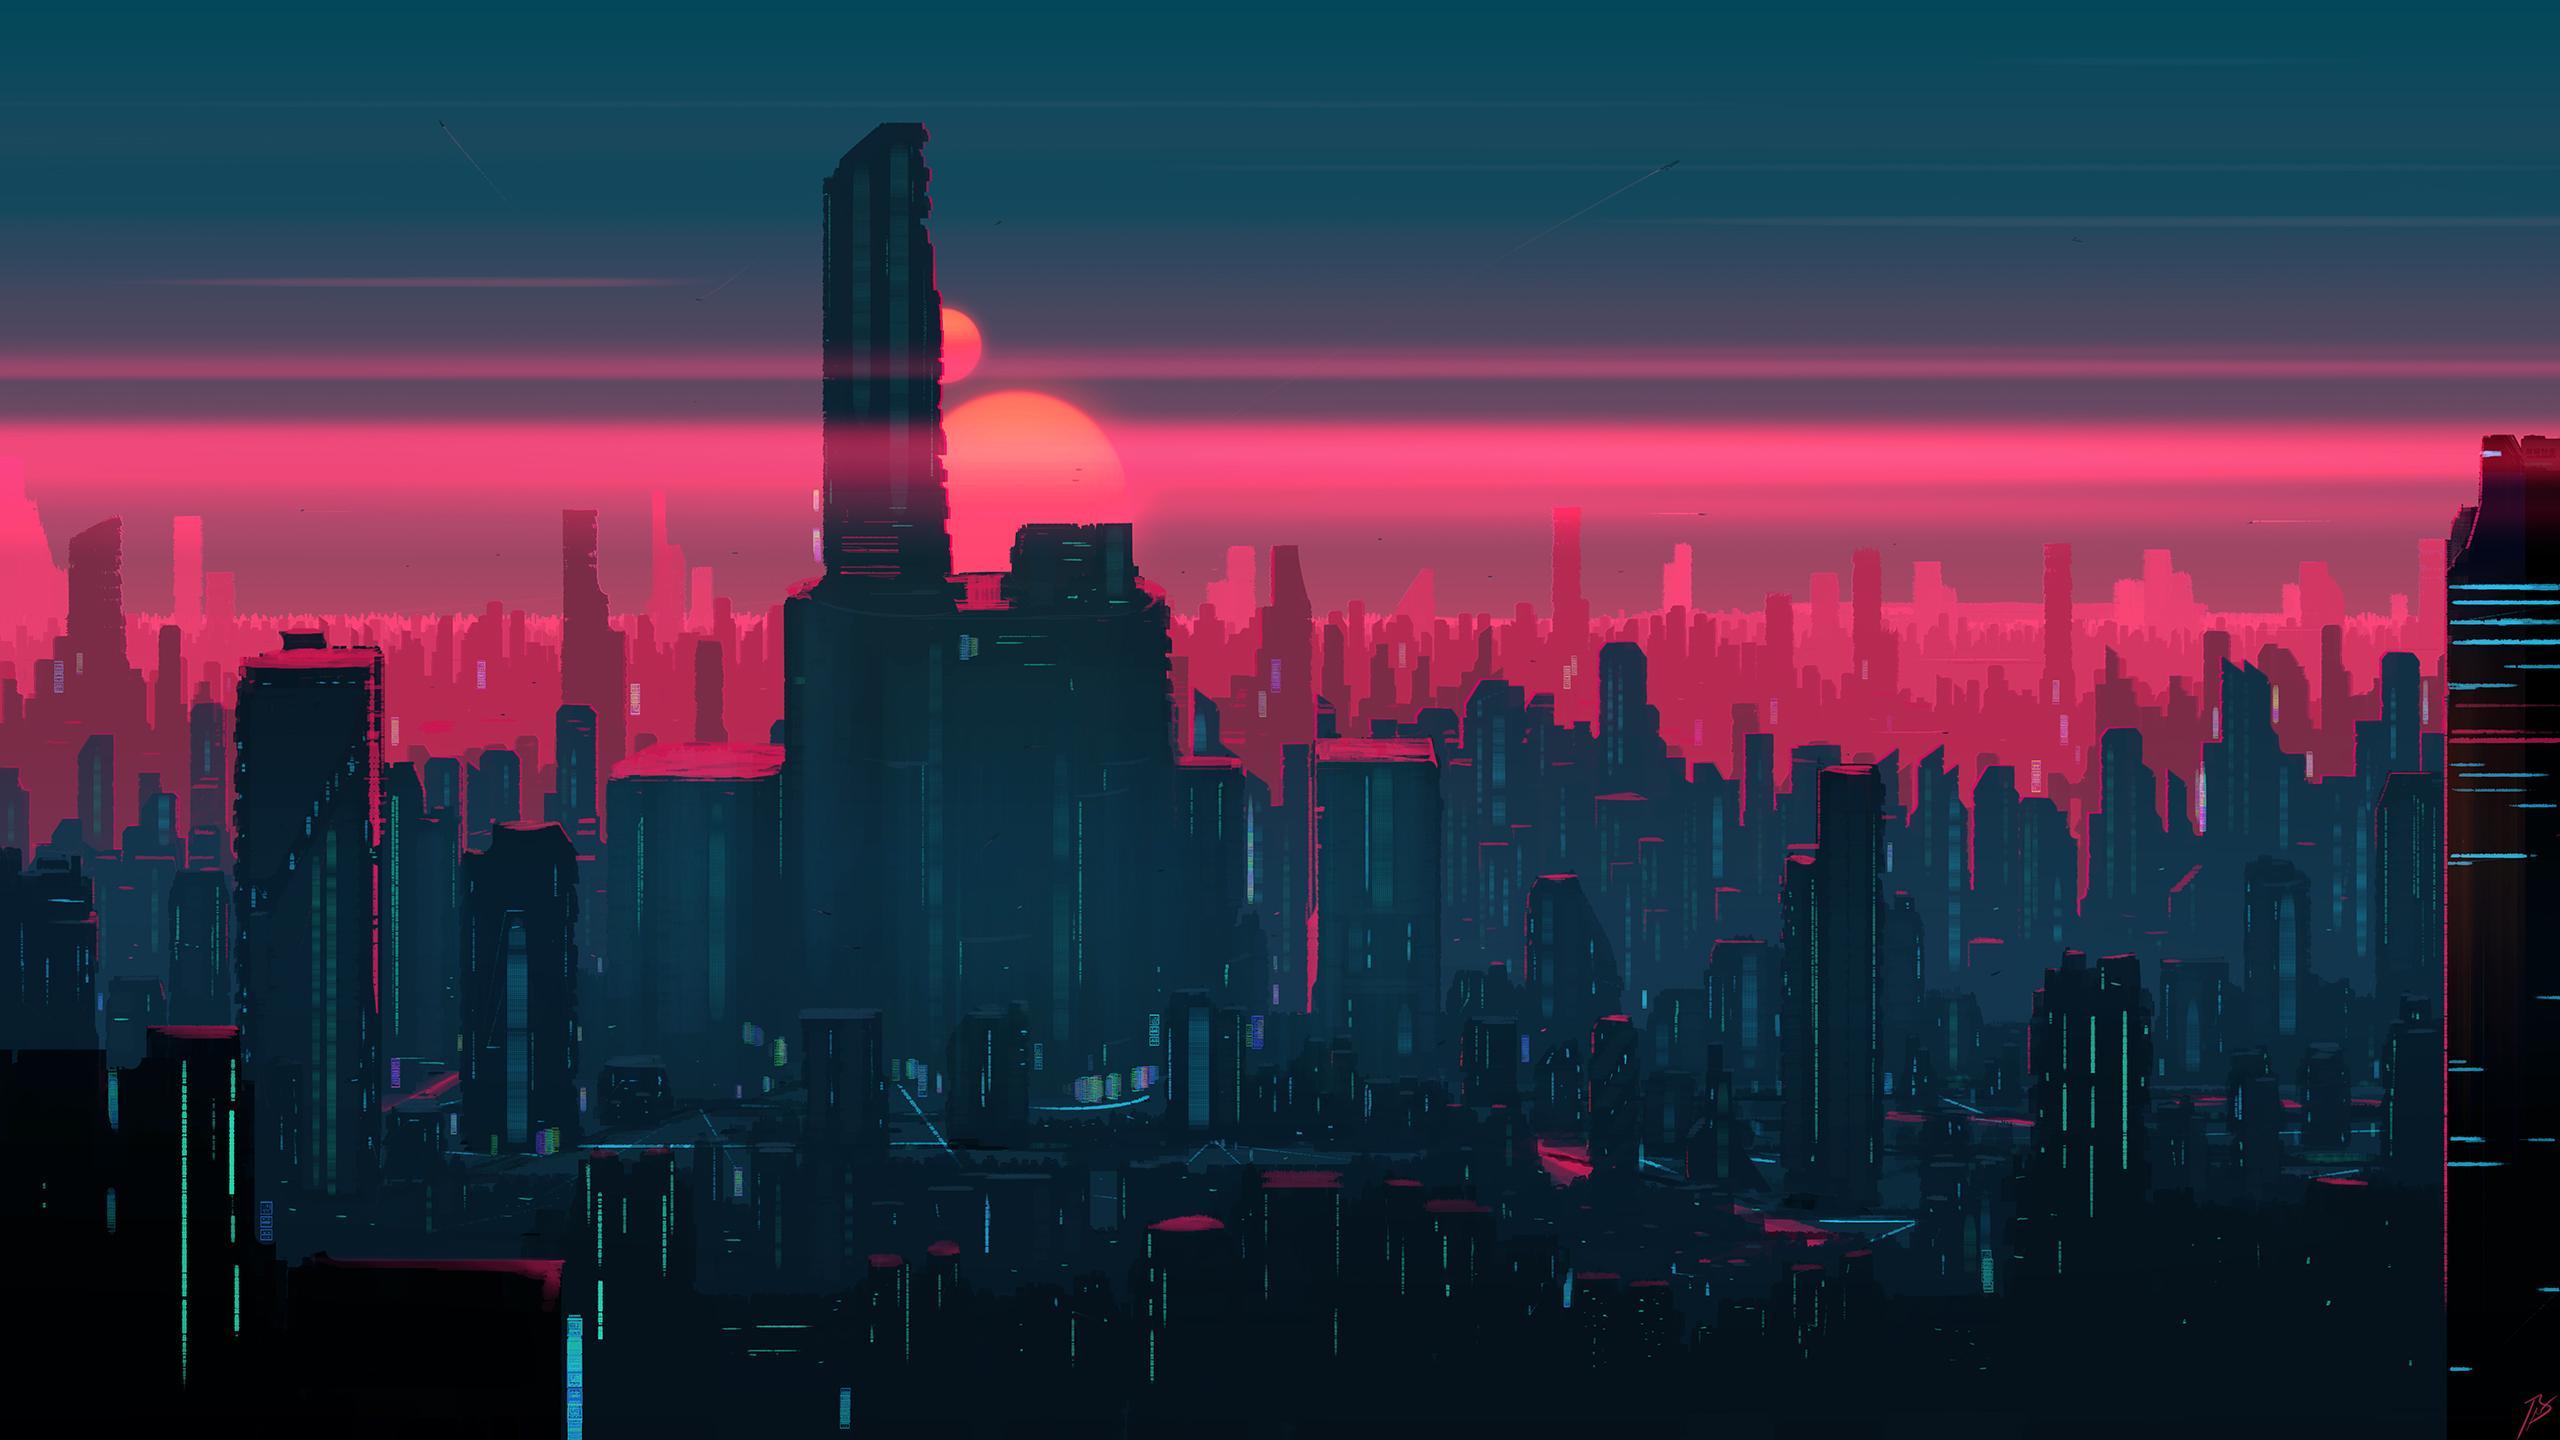 Neon City [2560x1440] wallpaper 2560x1440